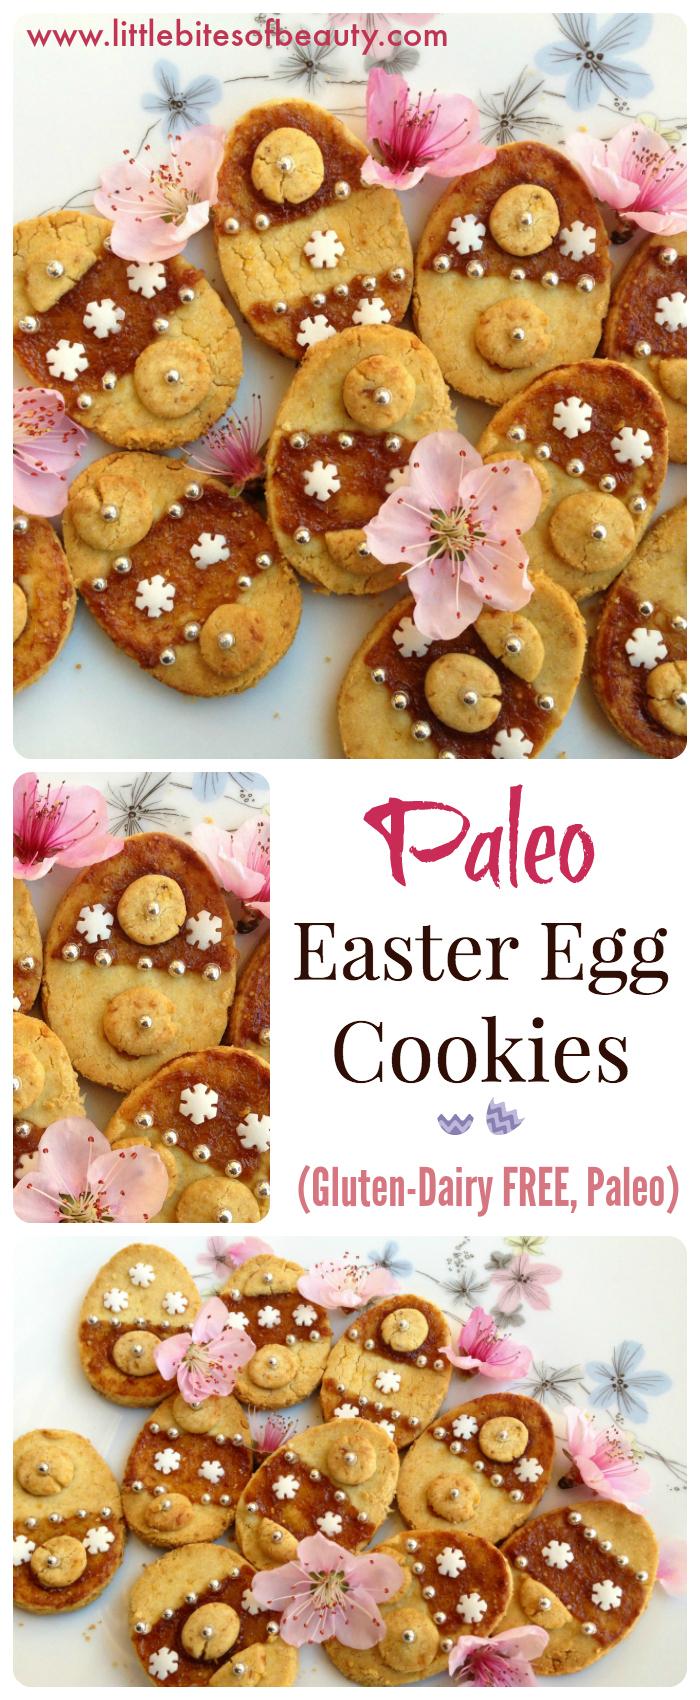 Paleo Easter Egg Cookies - Little Bites Of Beauty